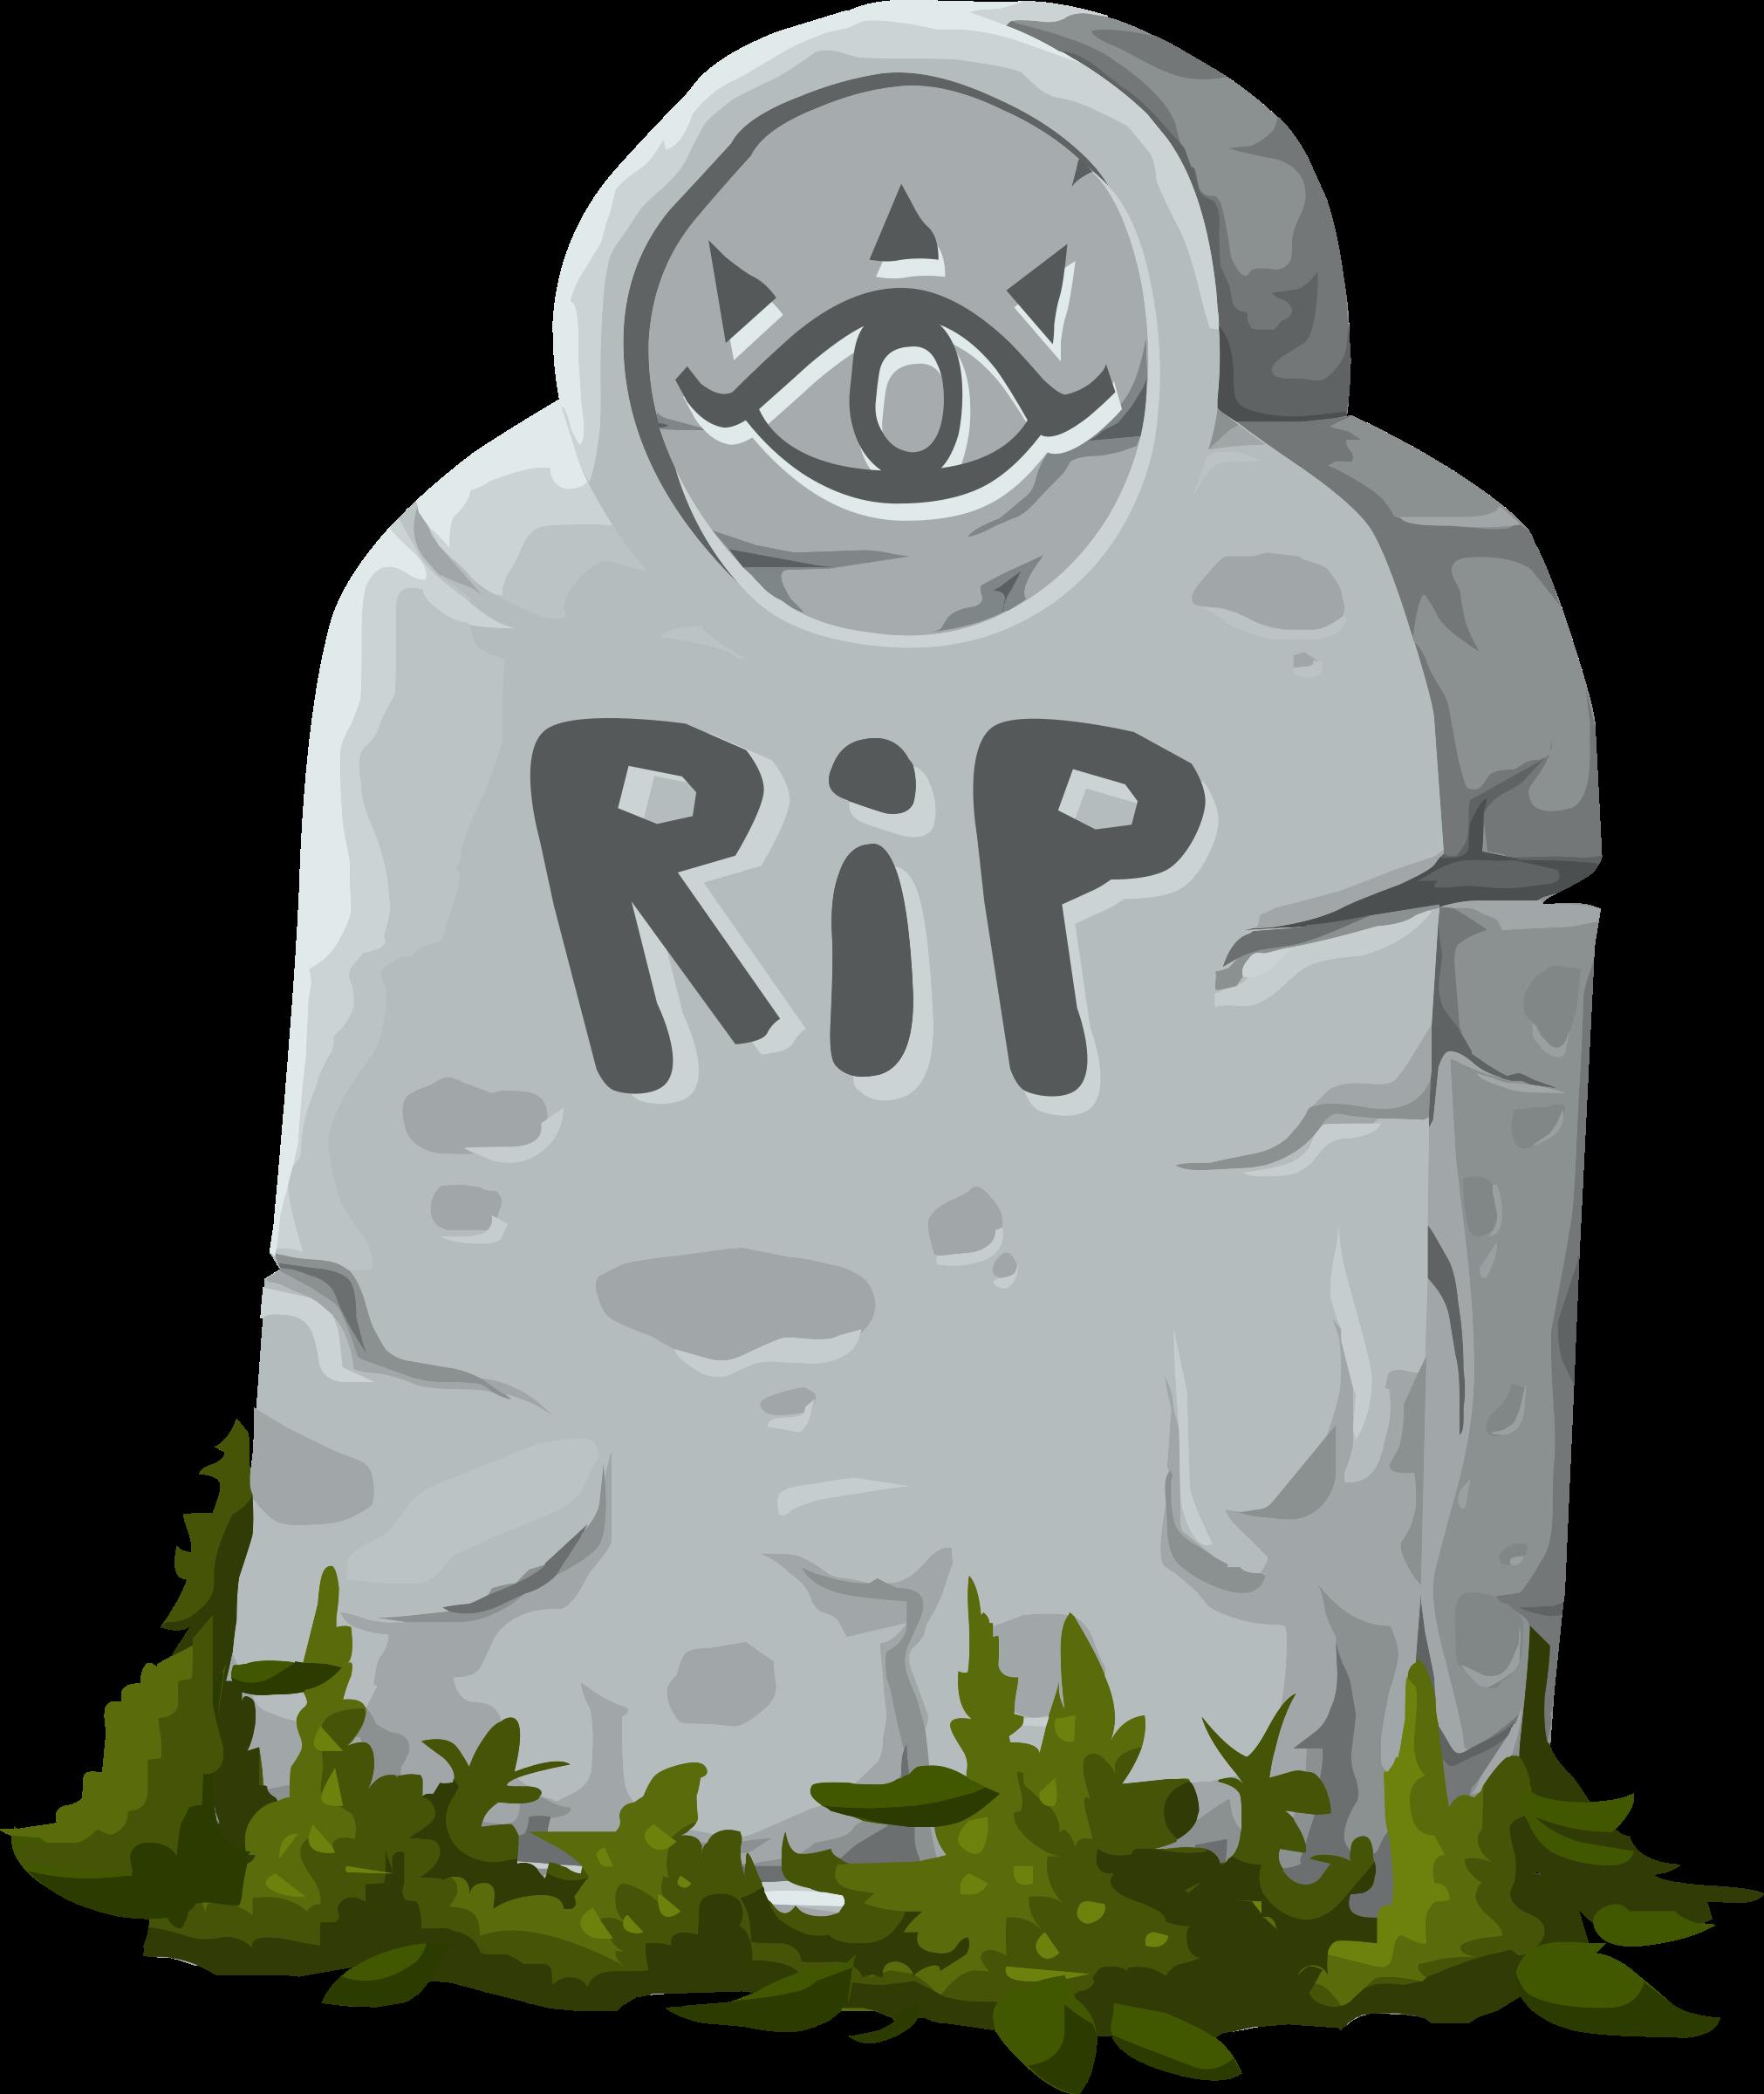 taiwan travel cemetery clip art el humor image home decor  [ 2022 x 2400 Pixel ]